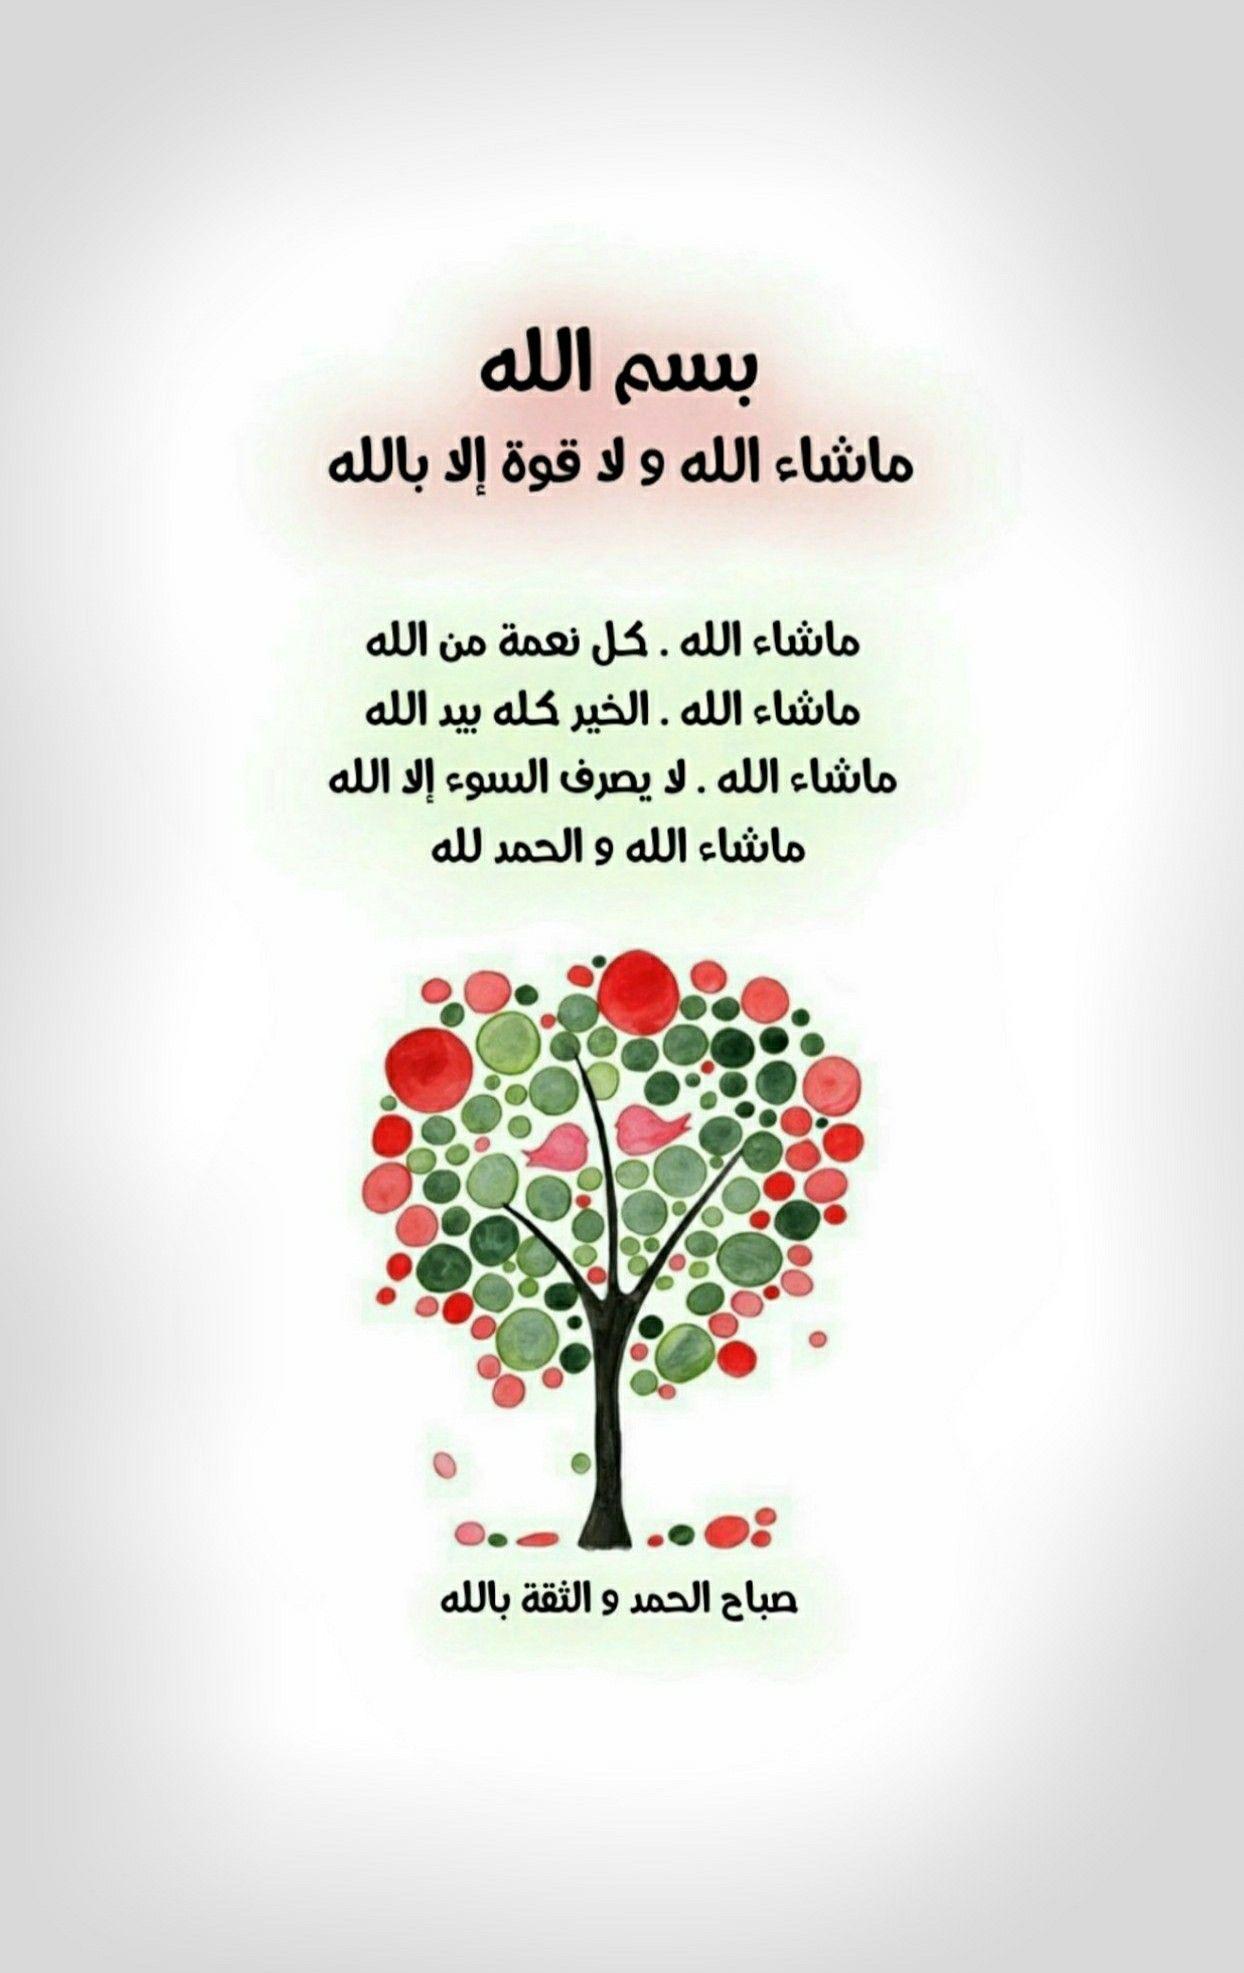 بسم الله ماشاء الله و لا قوة إلا بالله ماشاء الله كل نعمة من الله ماشاء الله الخير كله بيد ال Islamic Quotes Quran Islamic Quotes Good Morning Images